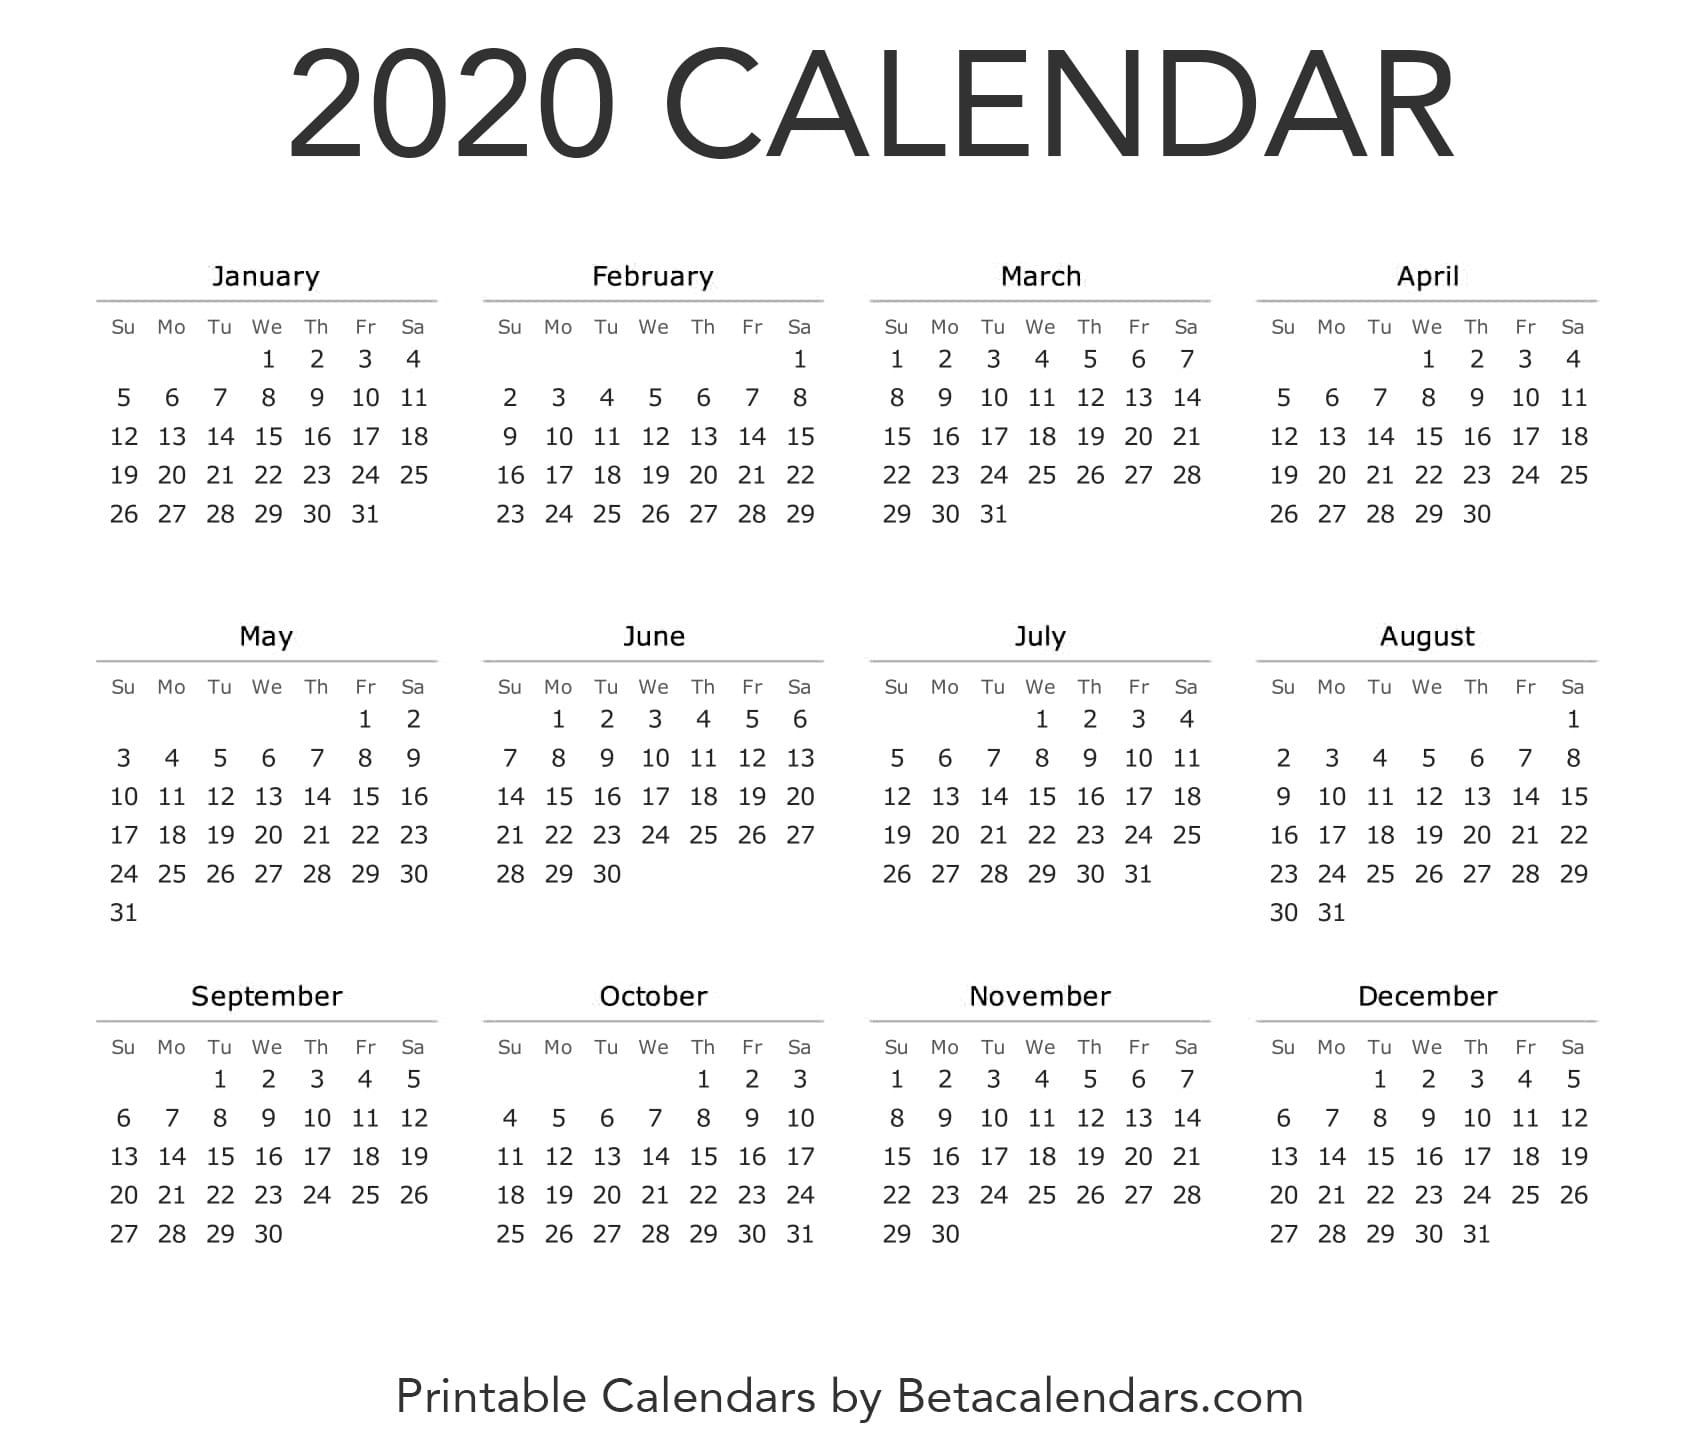 2020 Calendar - Free Printable Yearly Calendar 2020 in Tanduay Calendar 2020